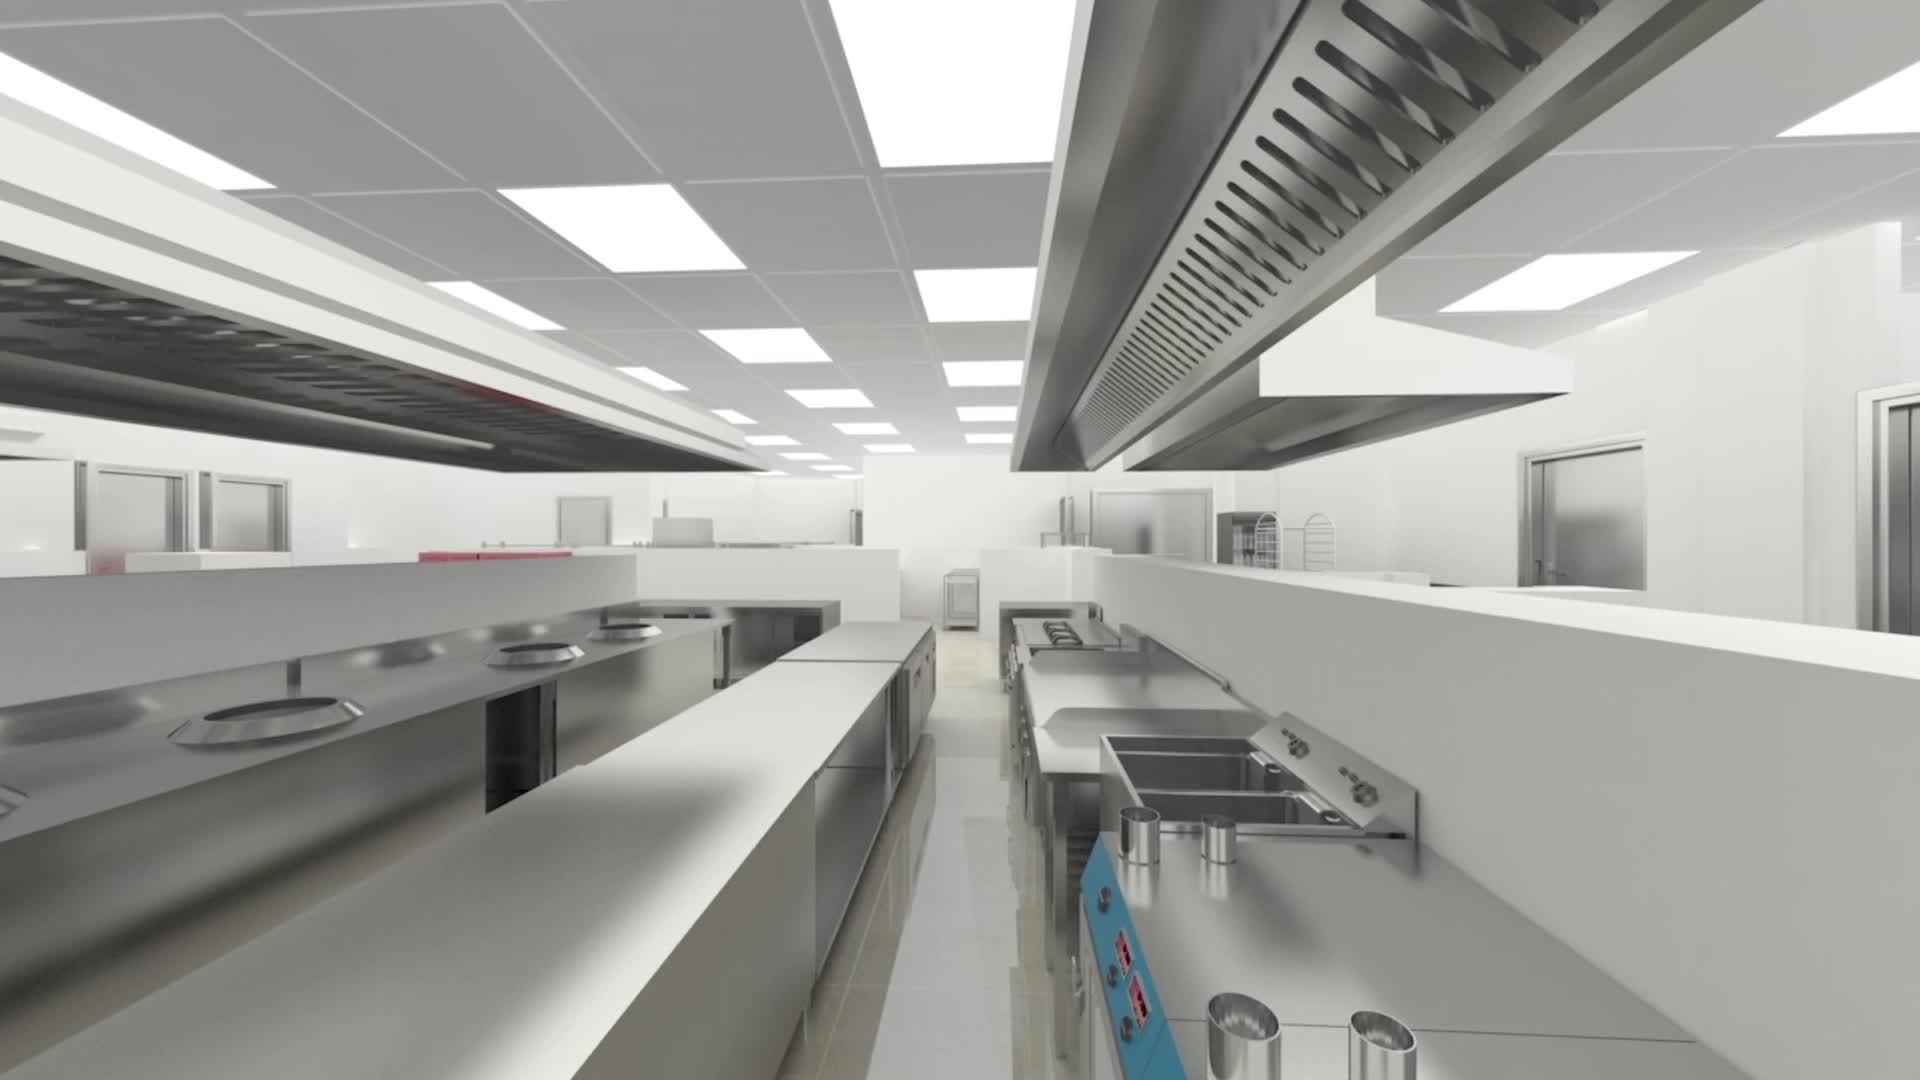 Cadレイアウト3d画像厨房デザイン